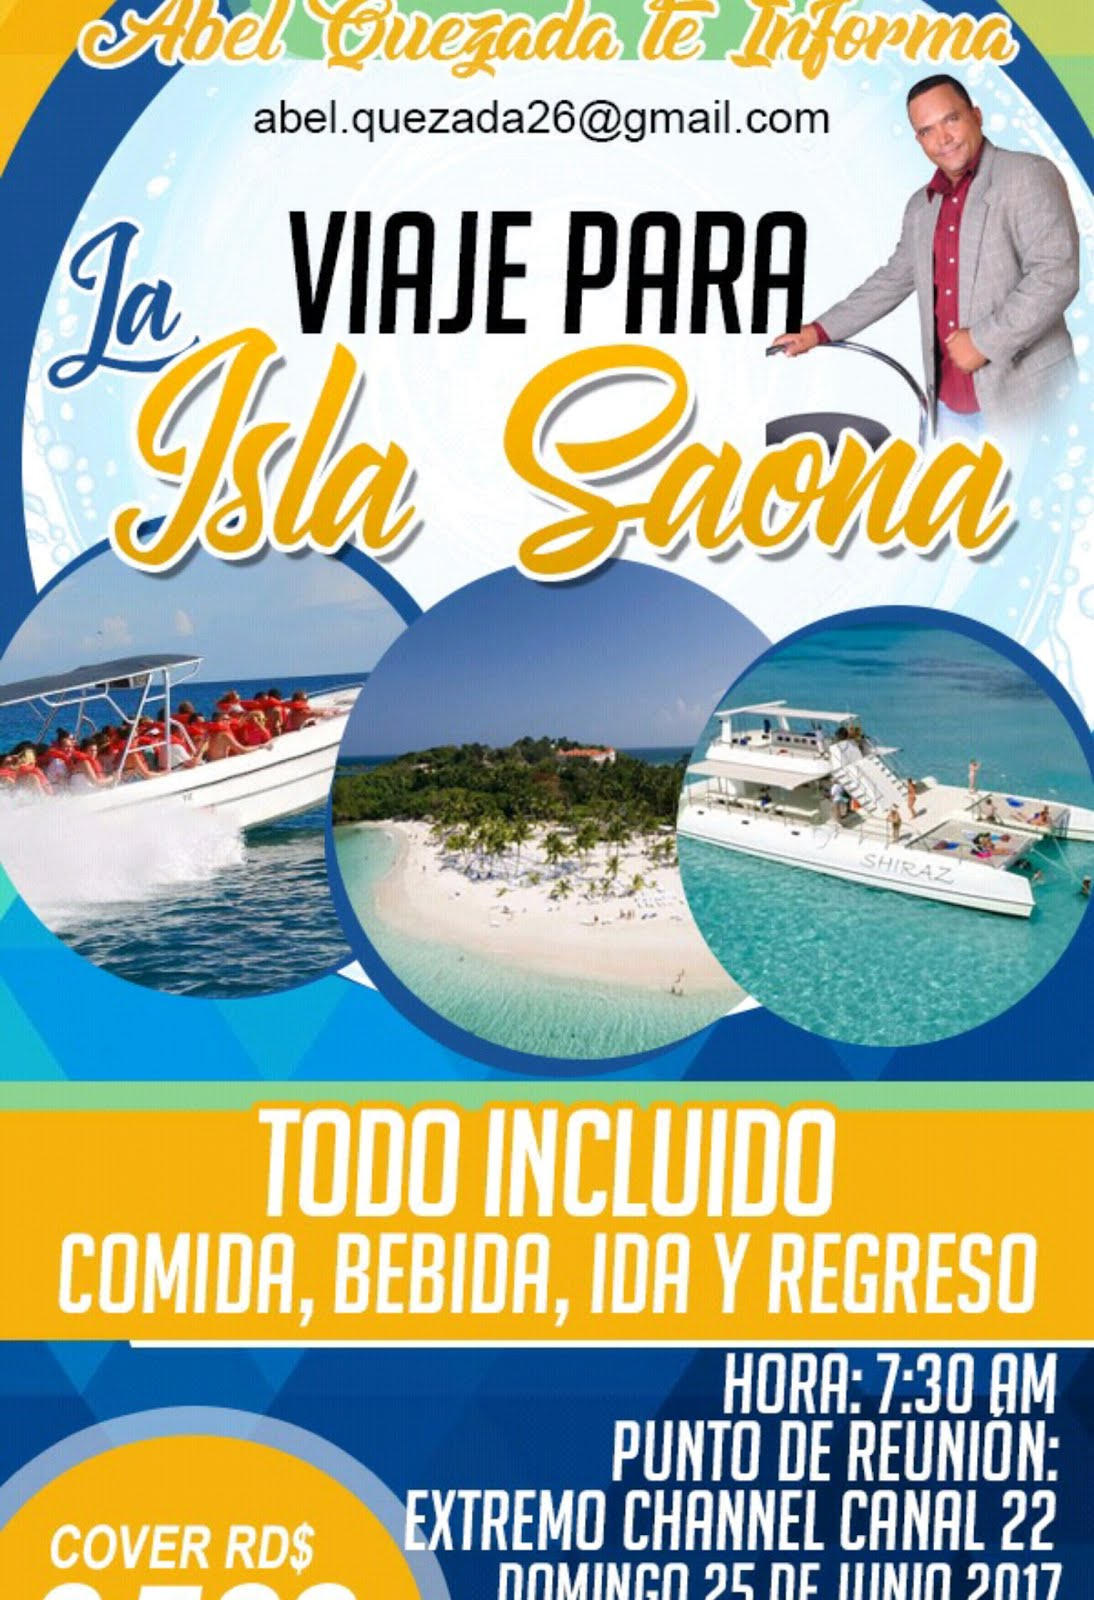 Vamonos a la Isla Saona domingo 25 de Junio  con AbelQuezada.com